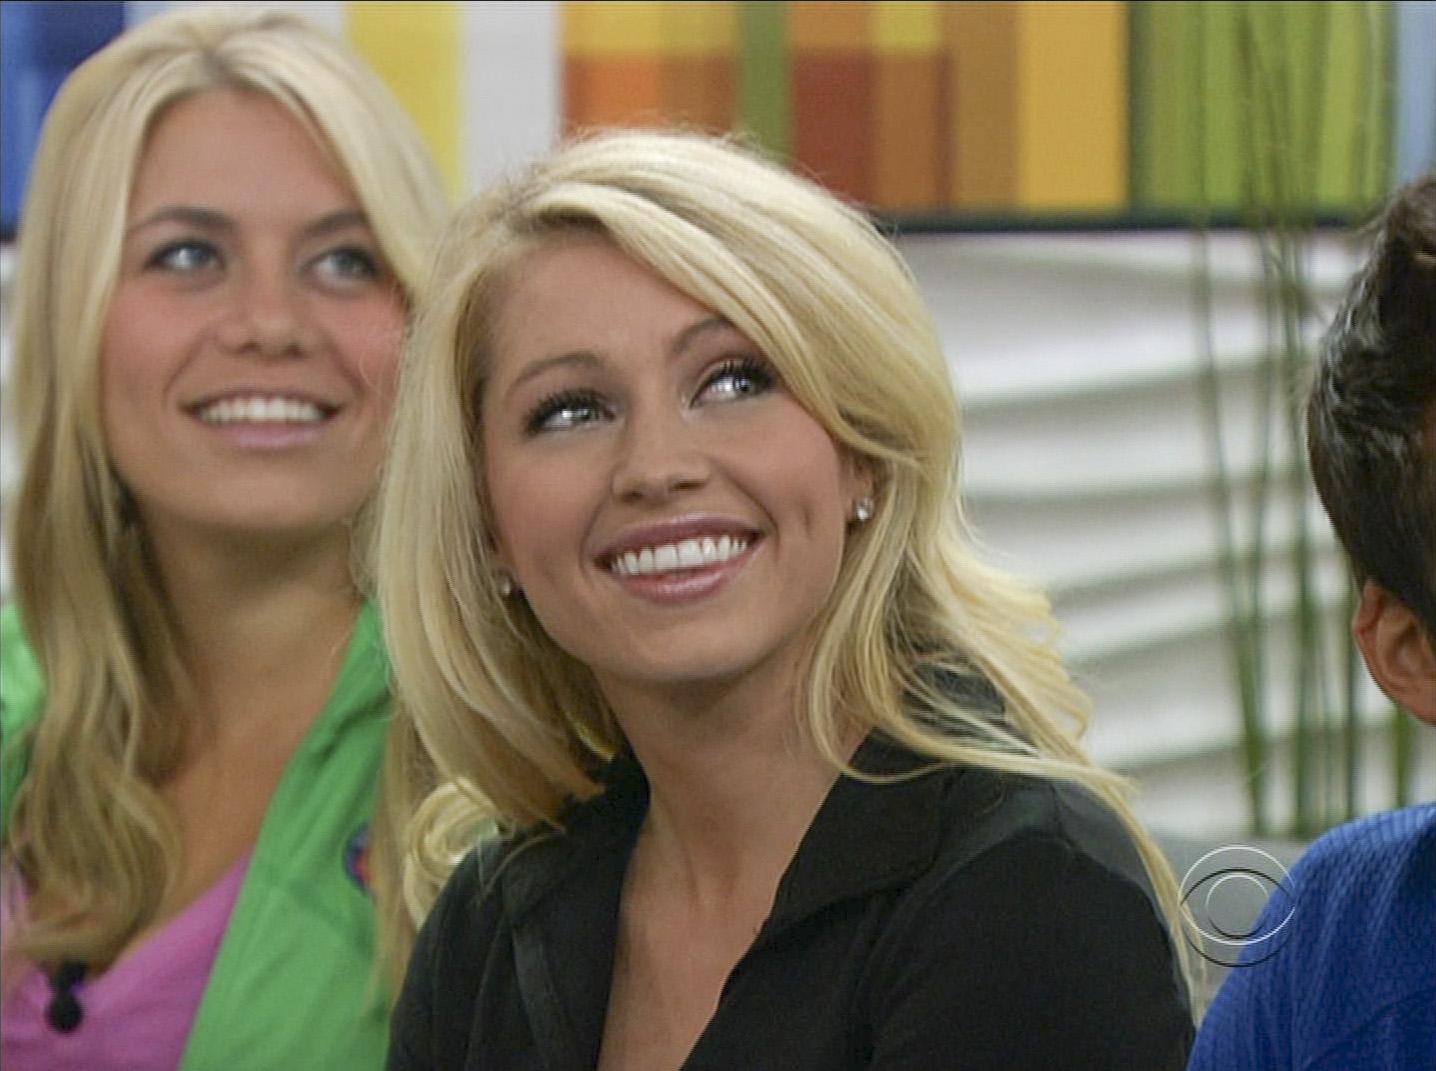 Britney and Ashley